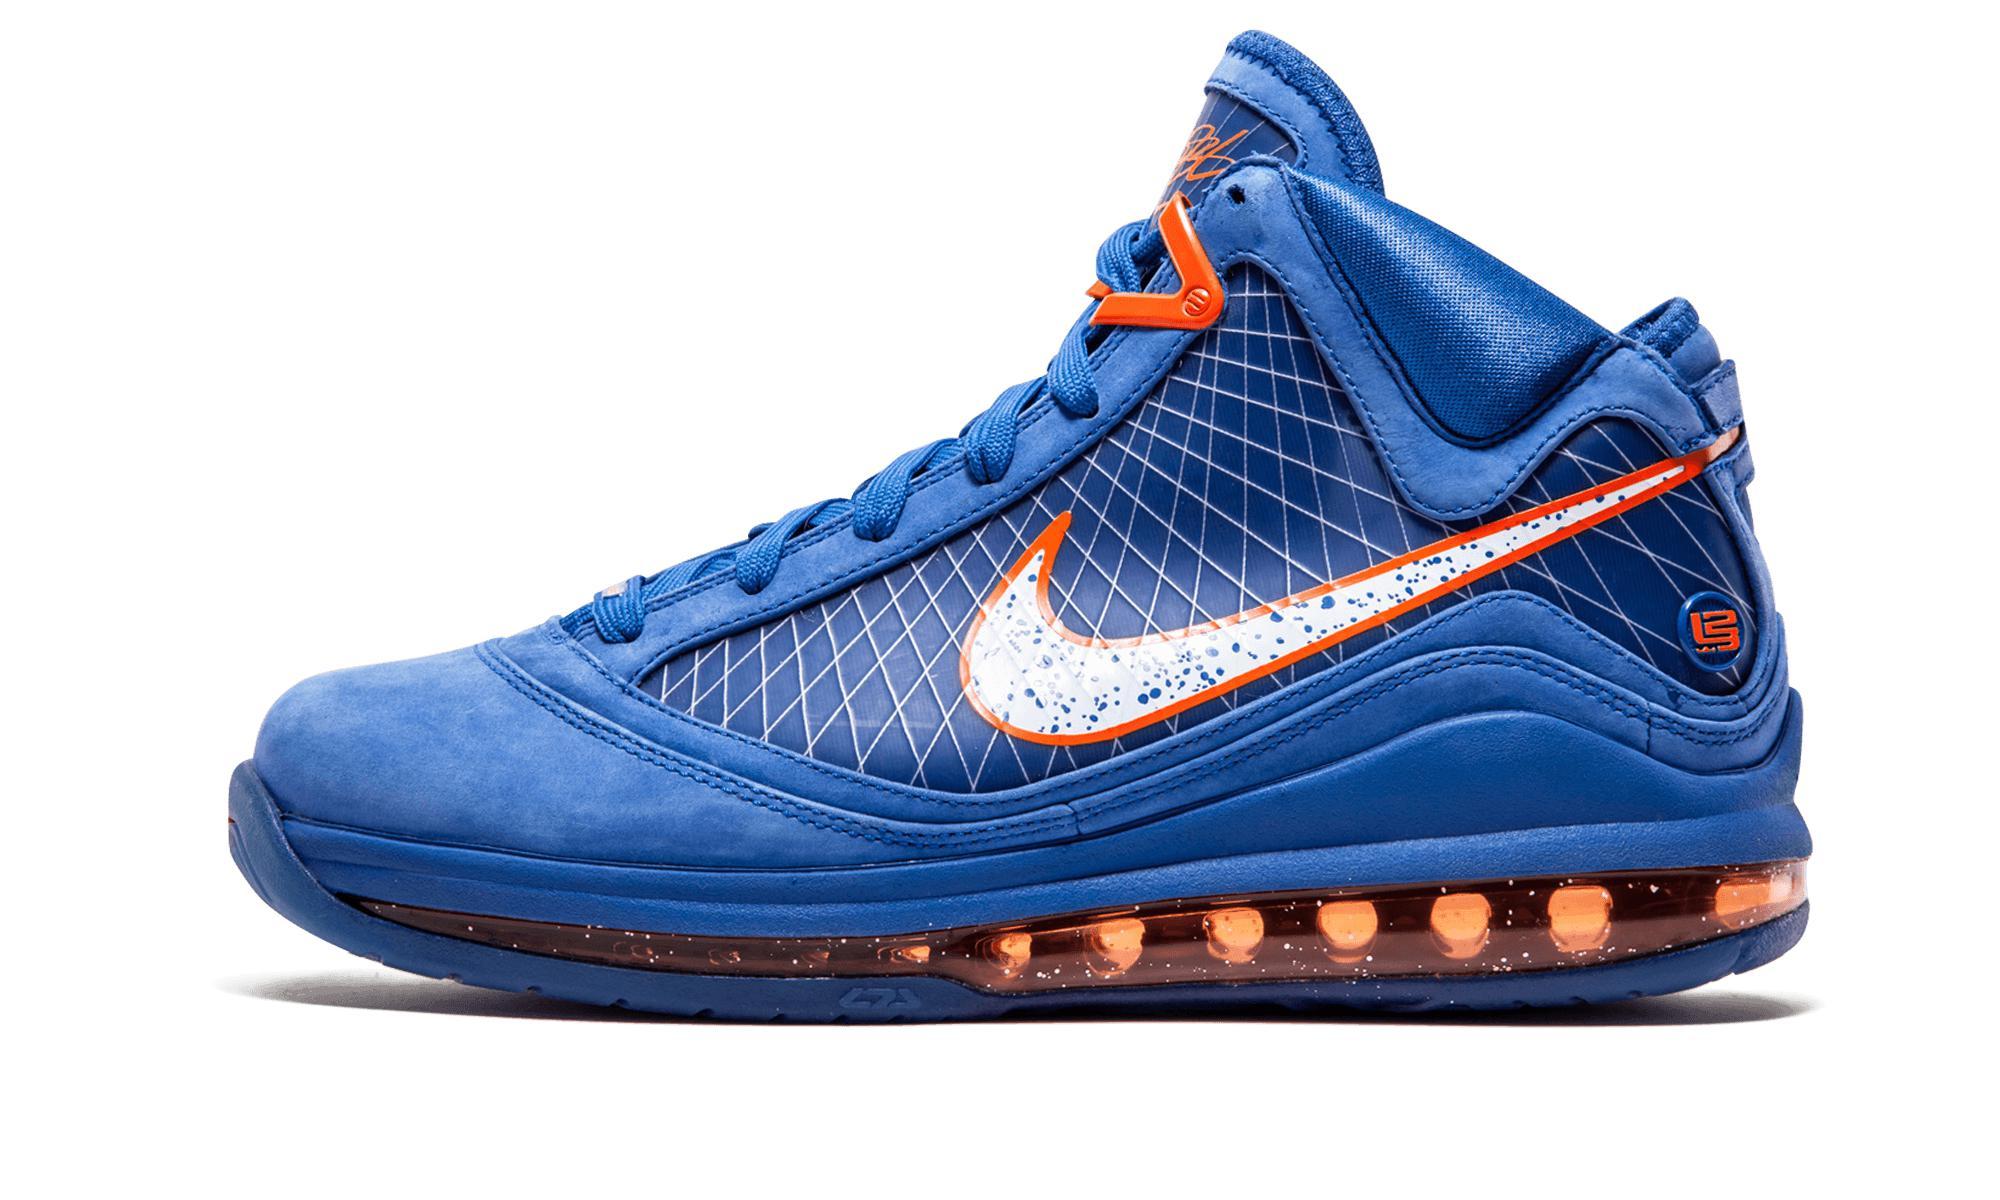 573e3455b96 Lyst - Nike Air Max Lebron 7 in Blue for Men